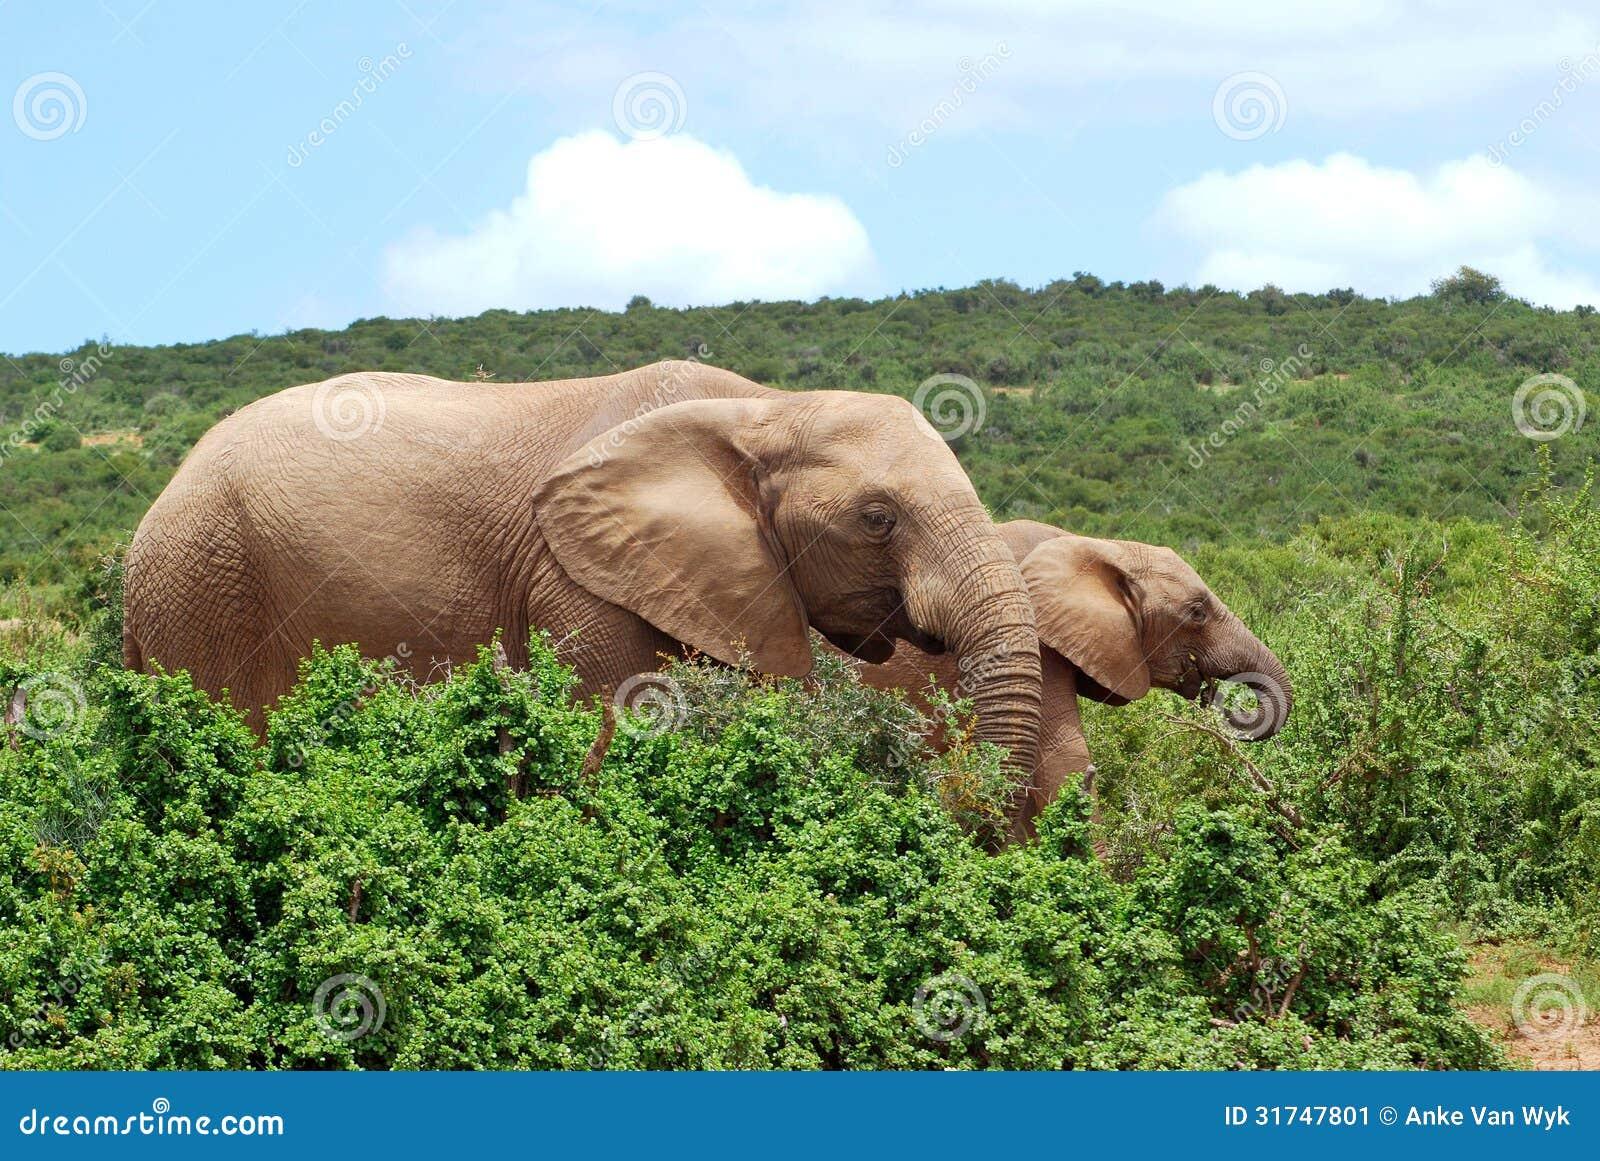 African elephants grazing